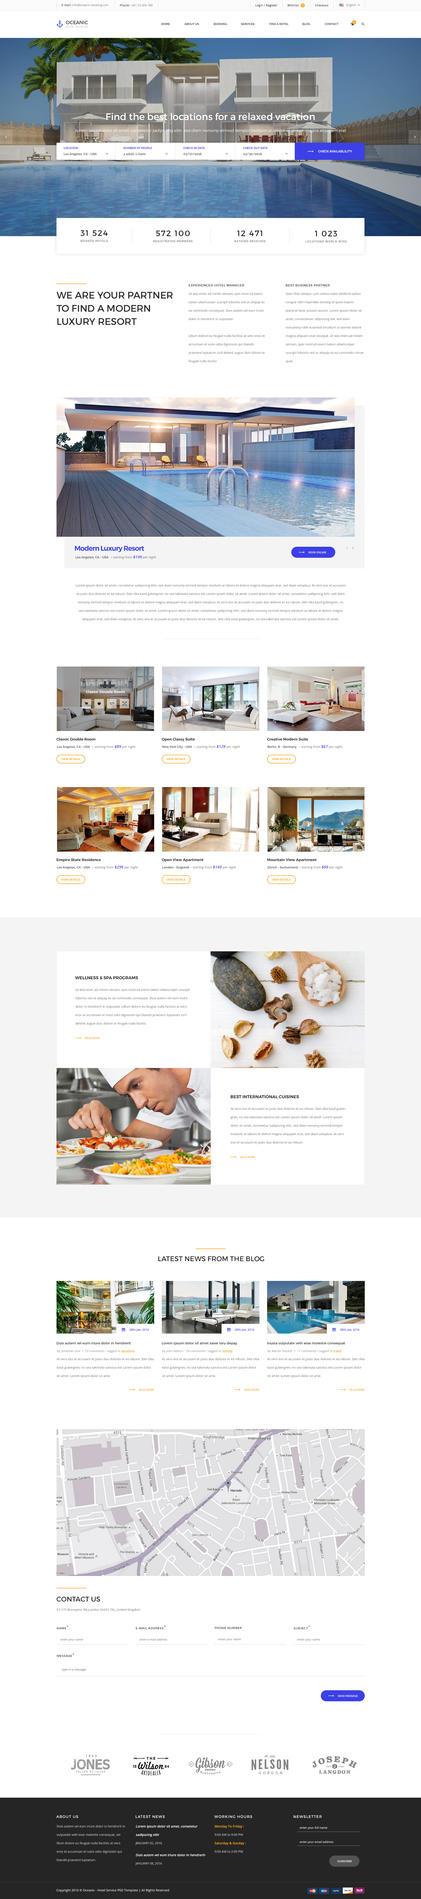 Web Room Booking Uwe Cpa